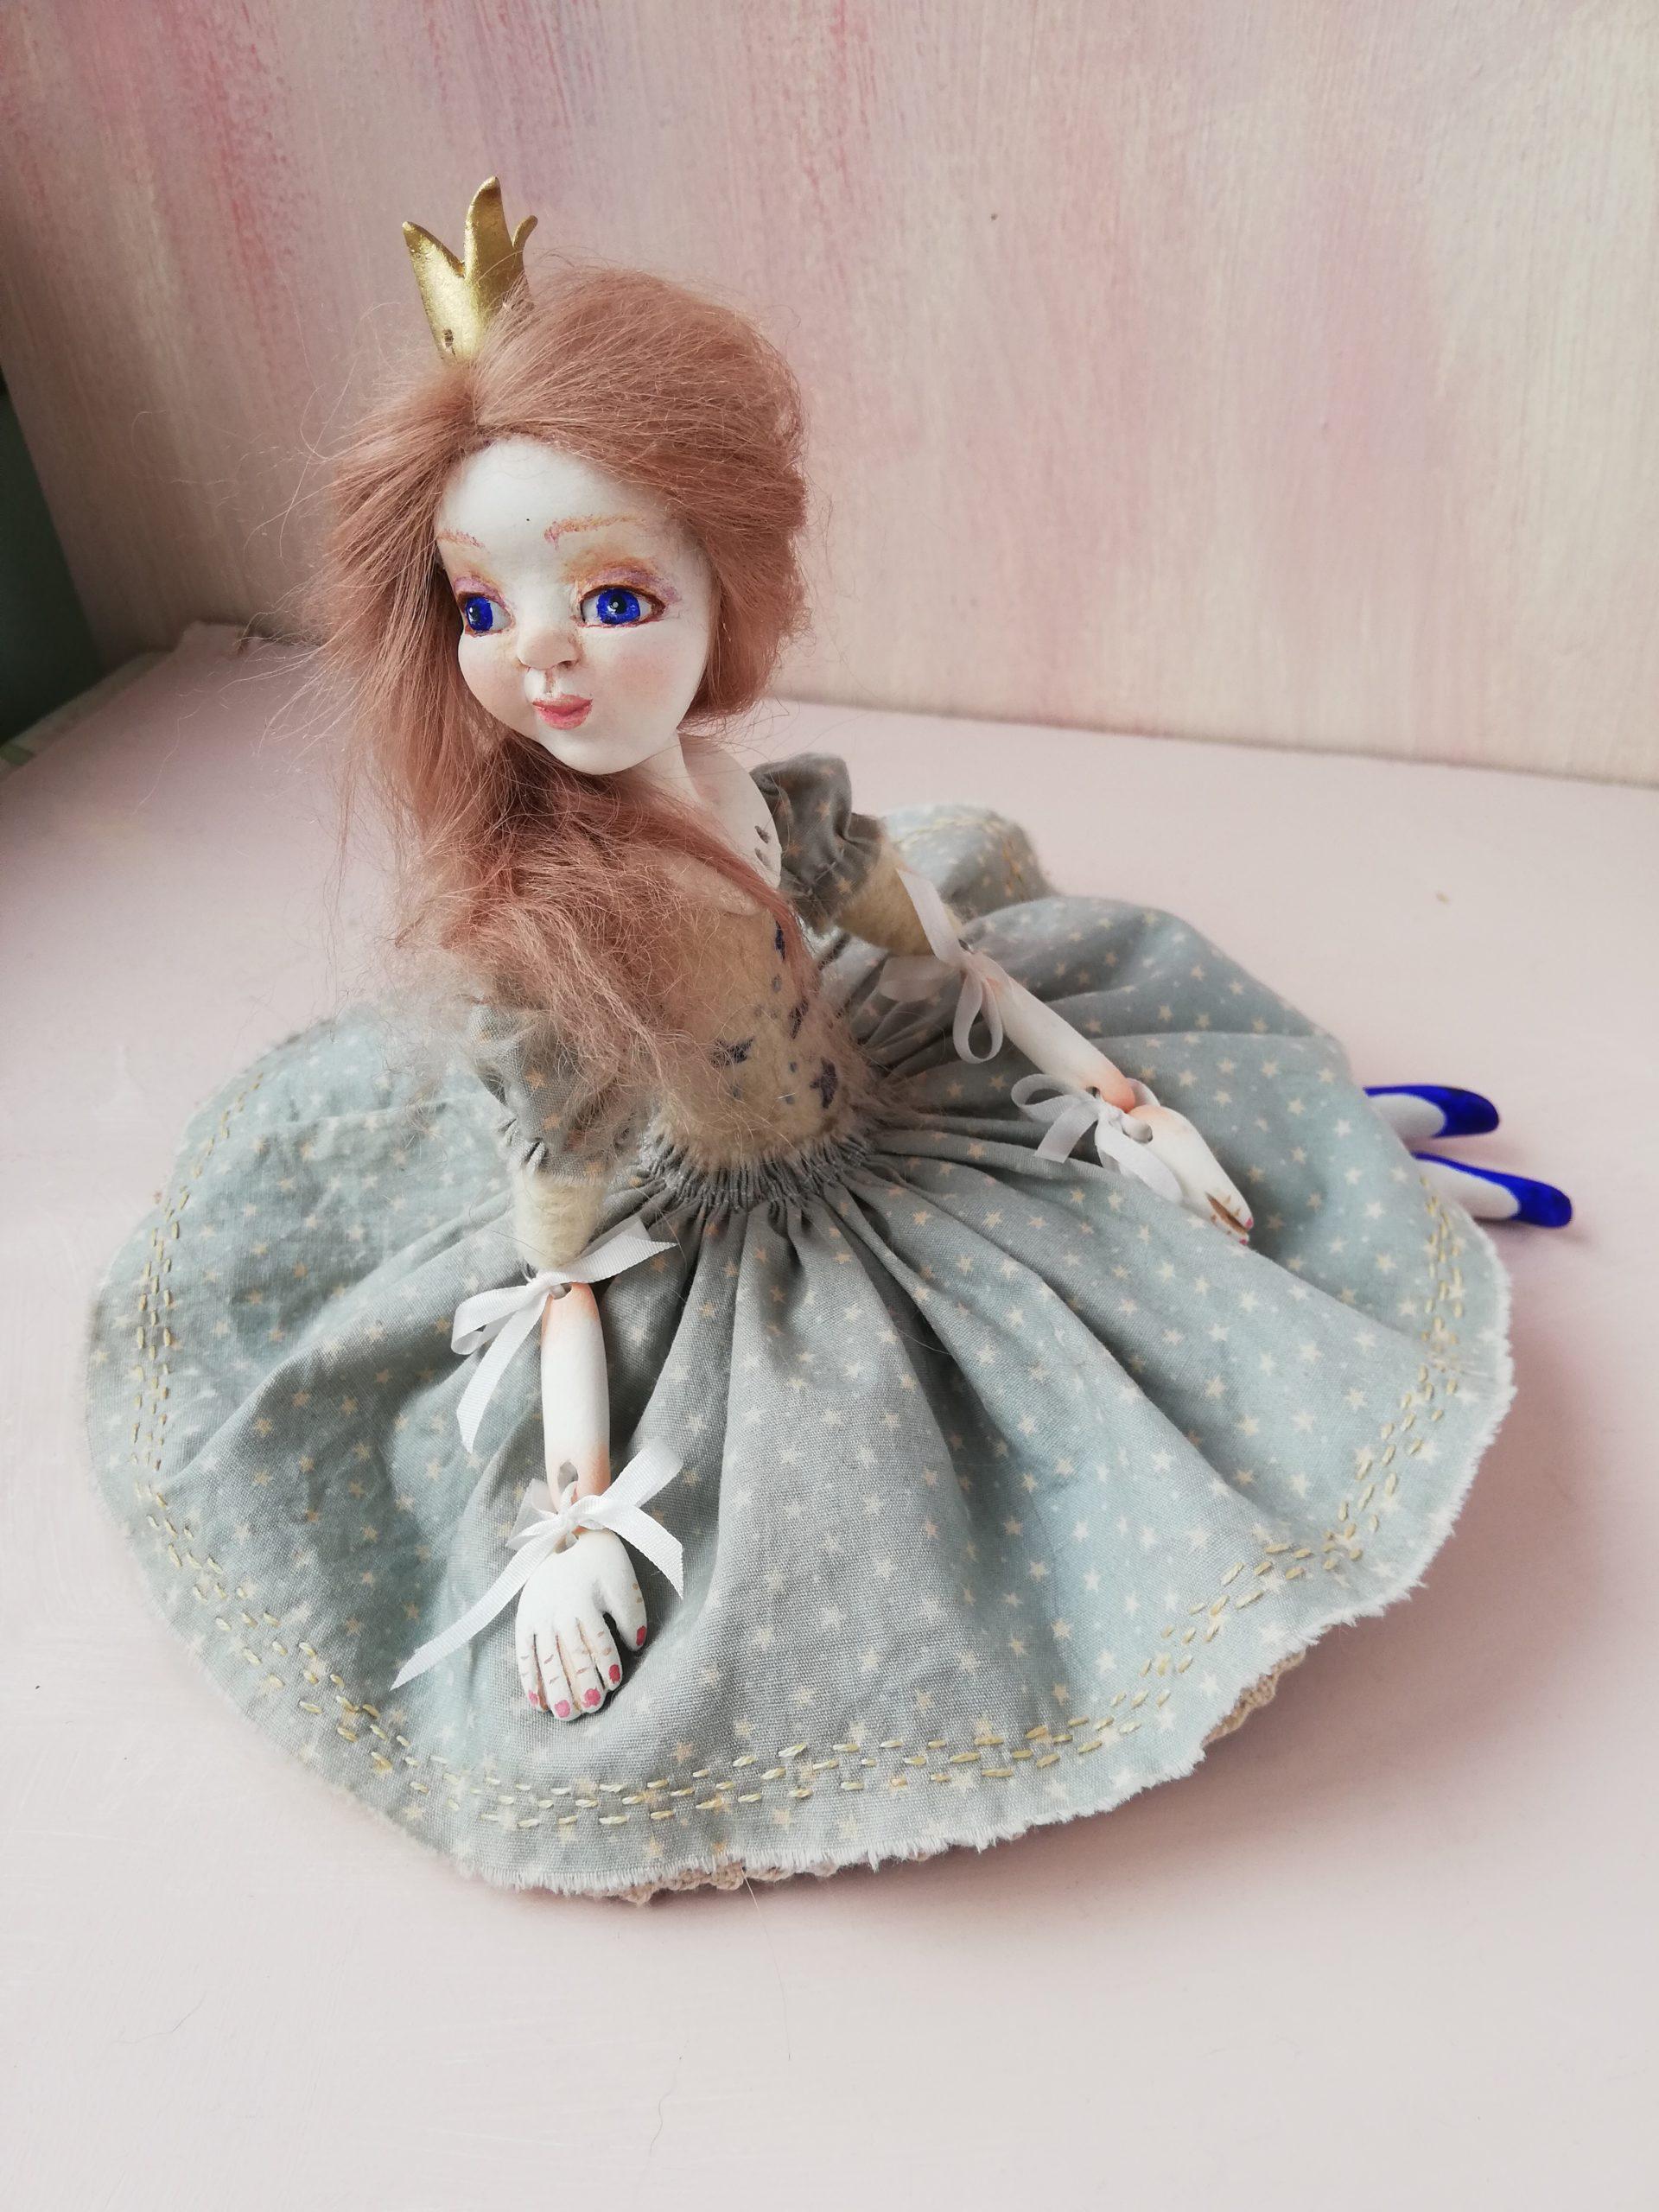 Skye ribbon jointed art doll